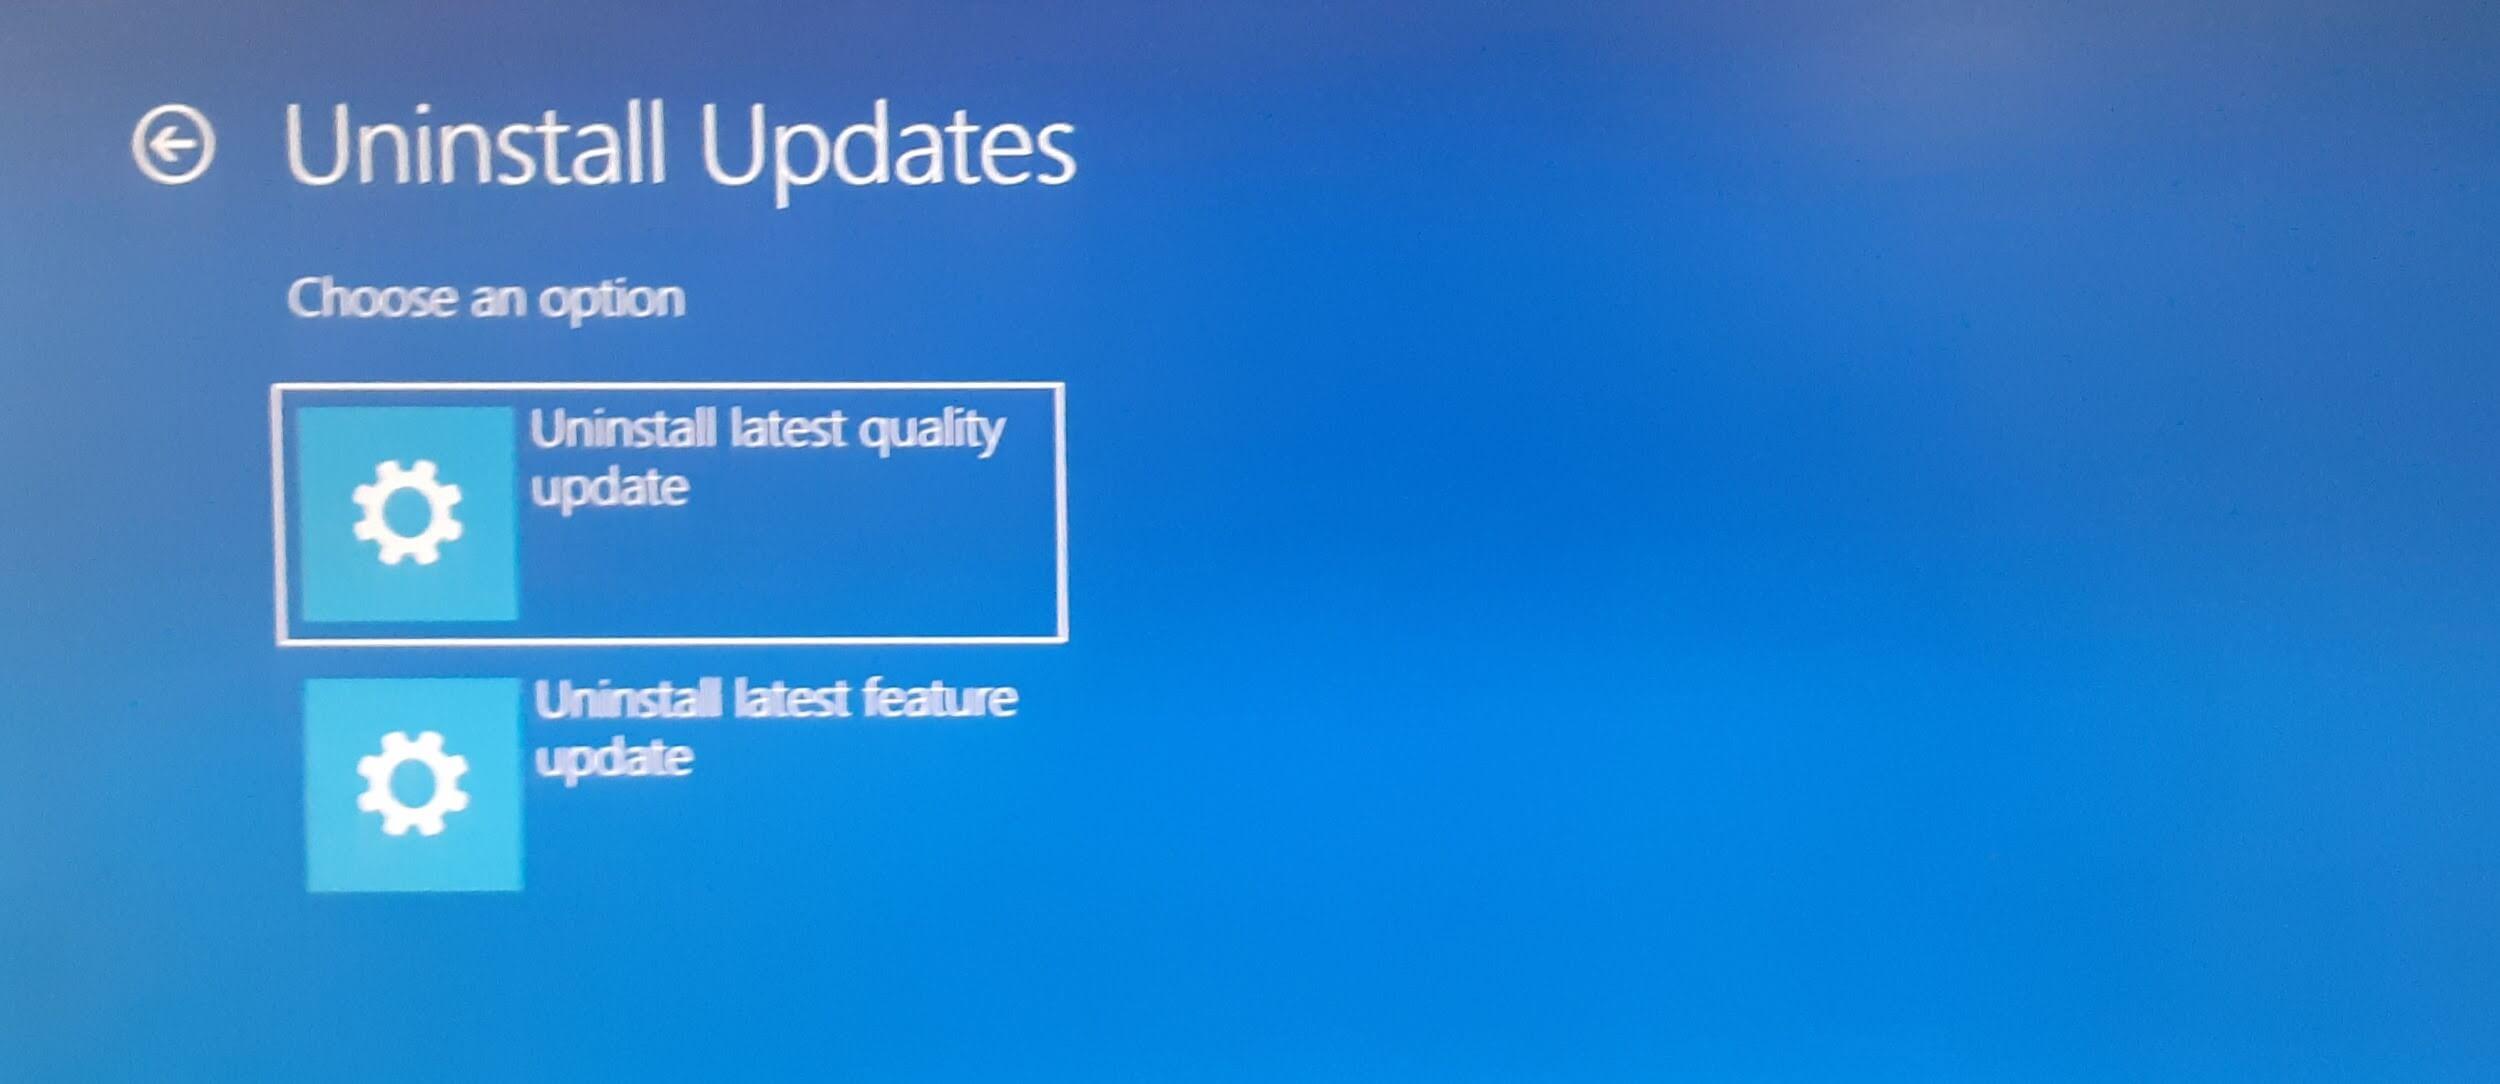 uninstall updates - uninstall windows updates